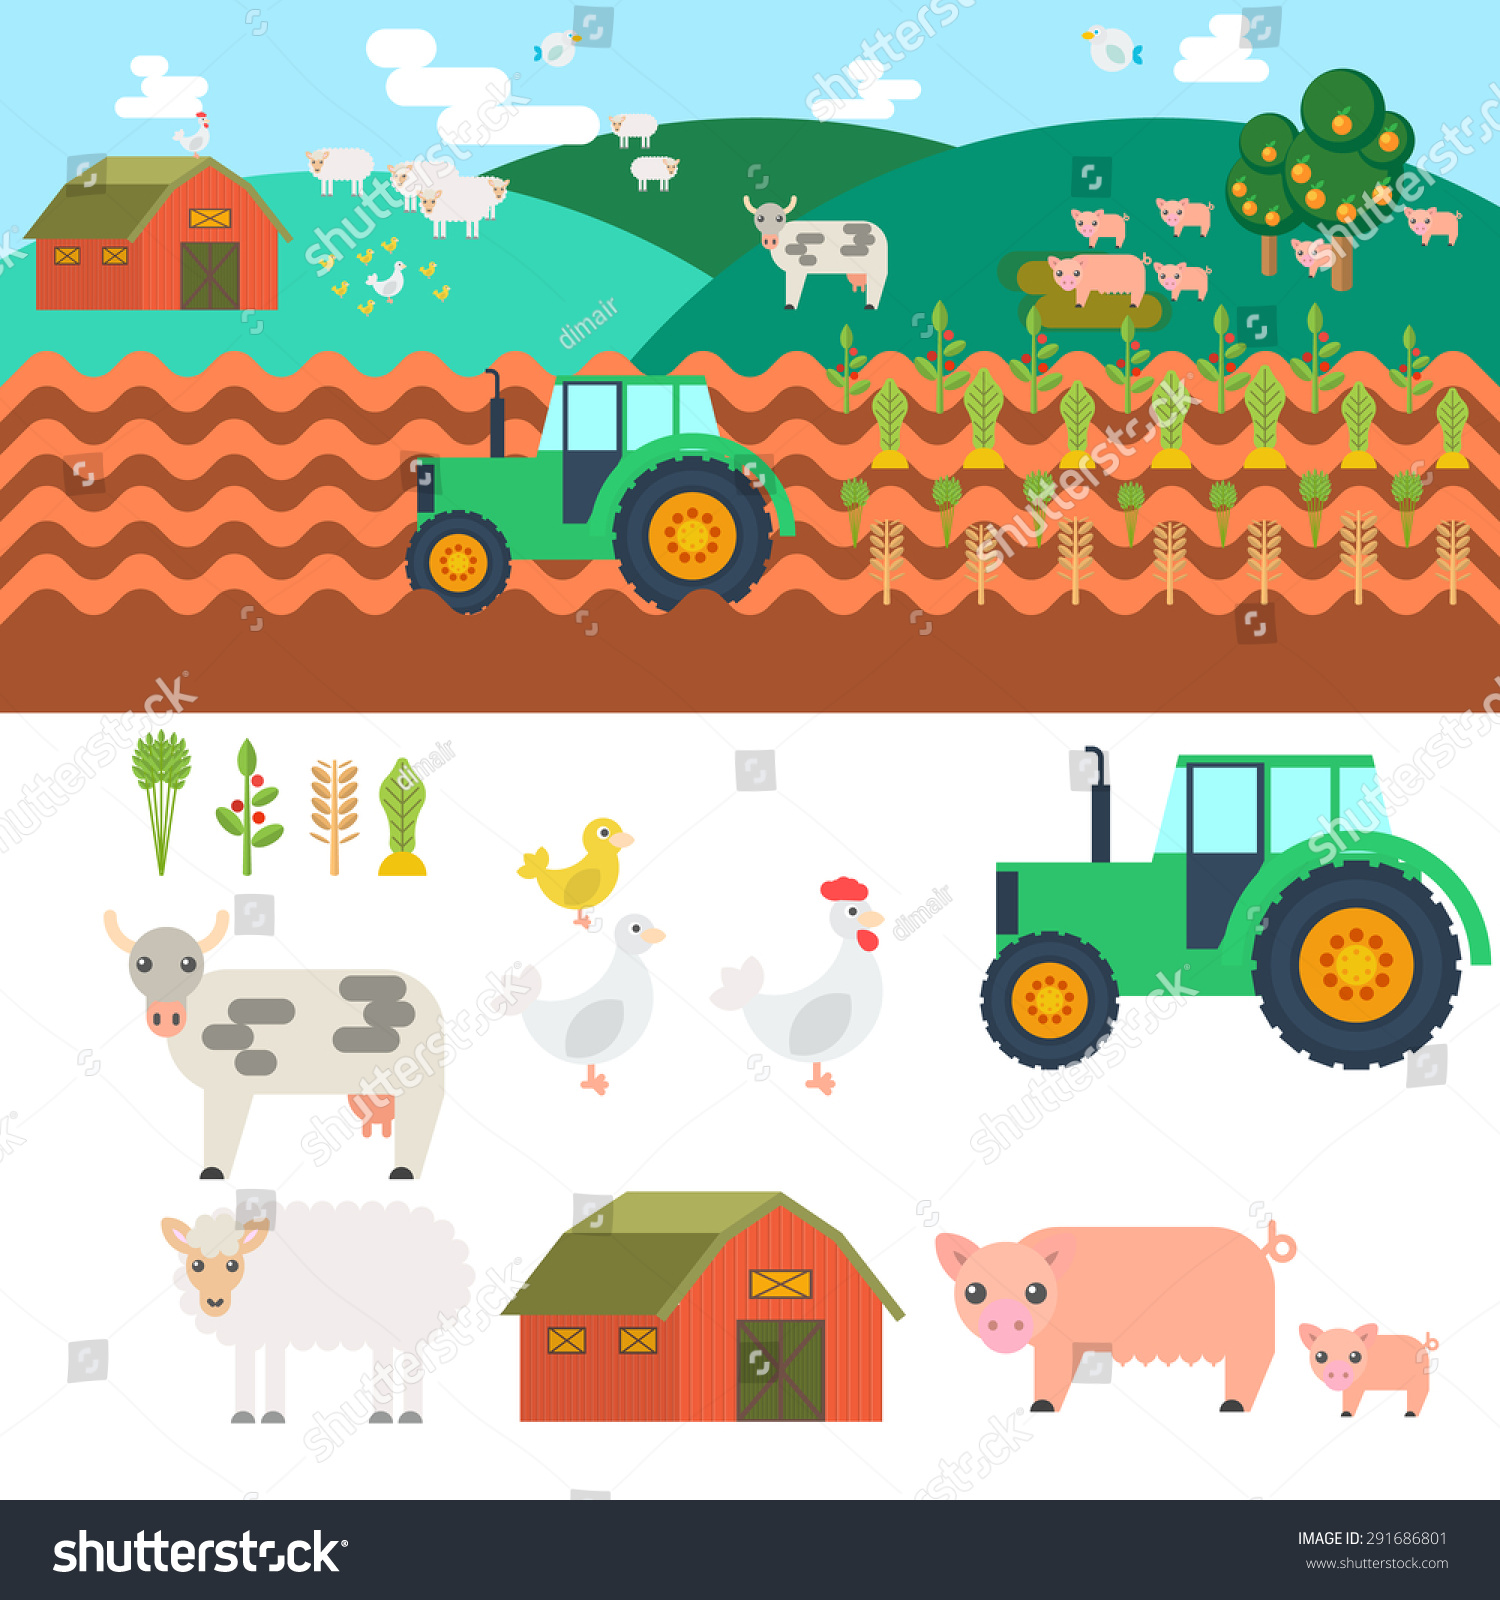 Farm Village Elements Game Sprites Tile Stock Vector